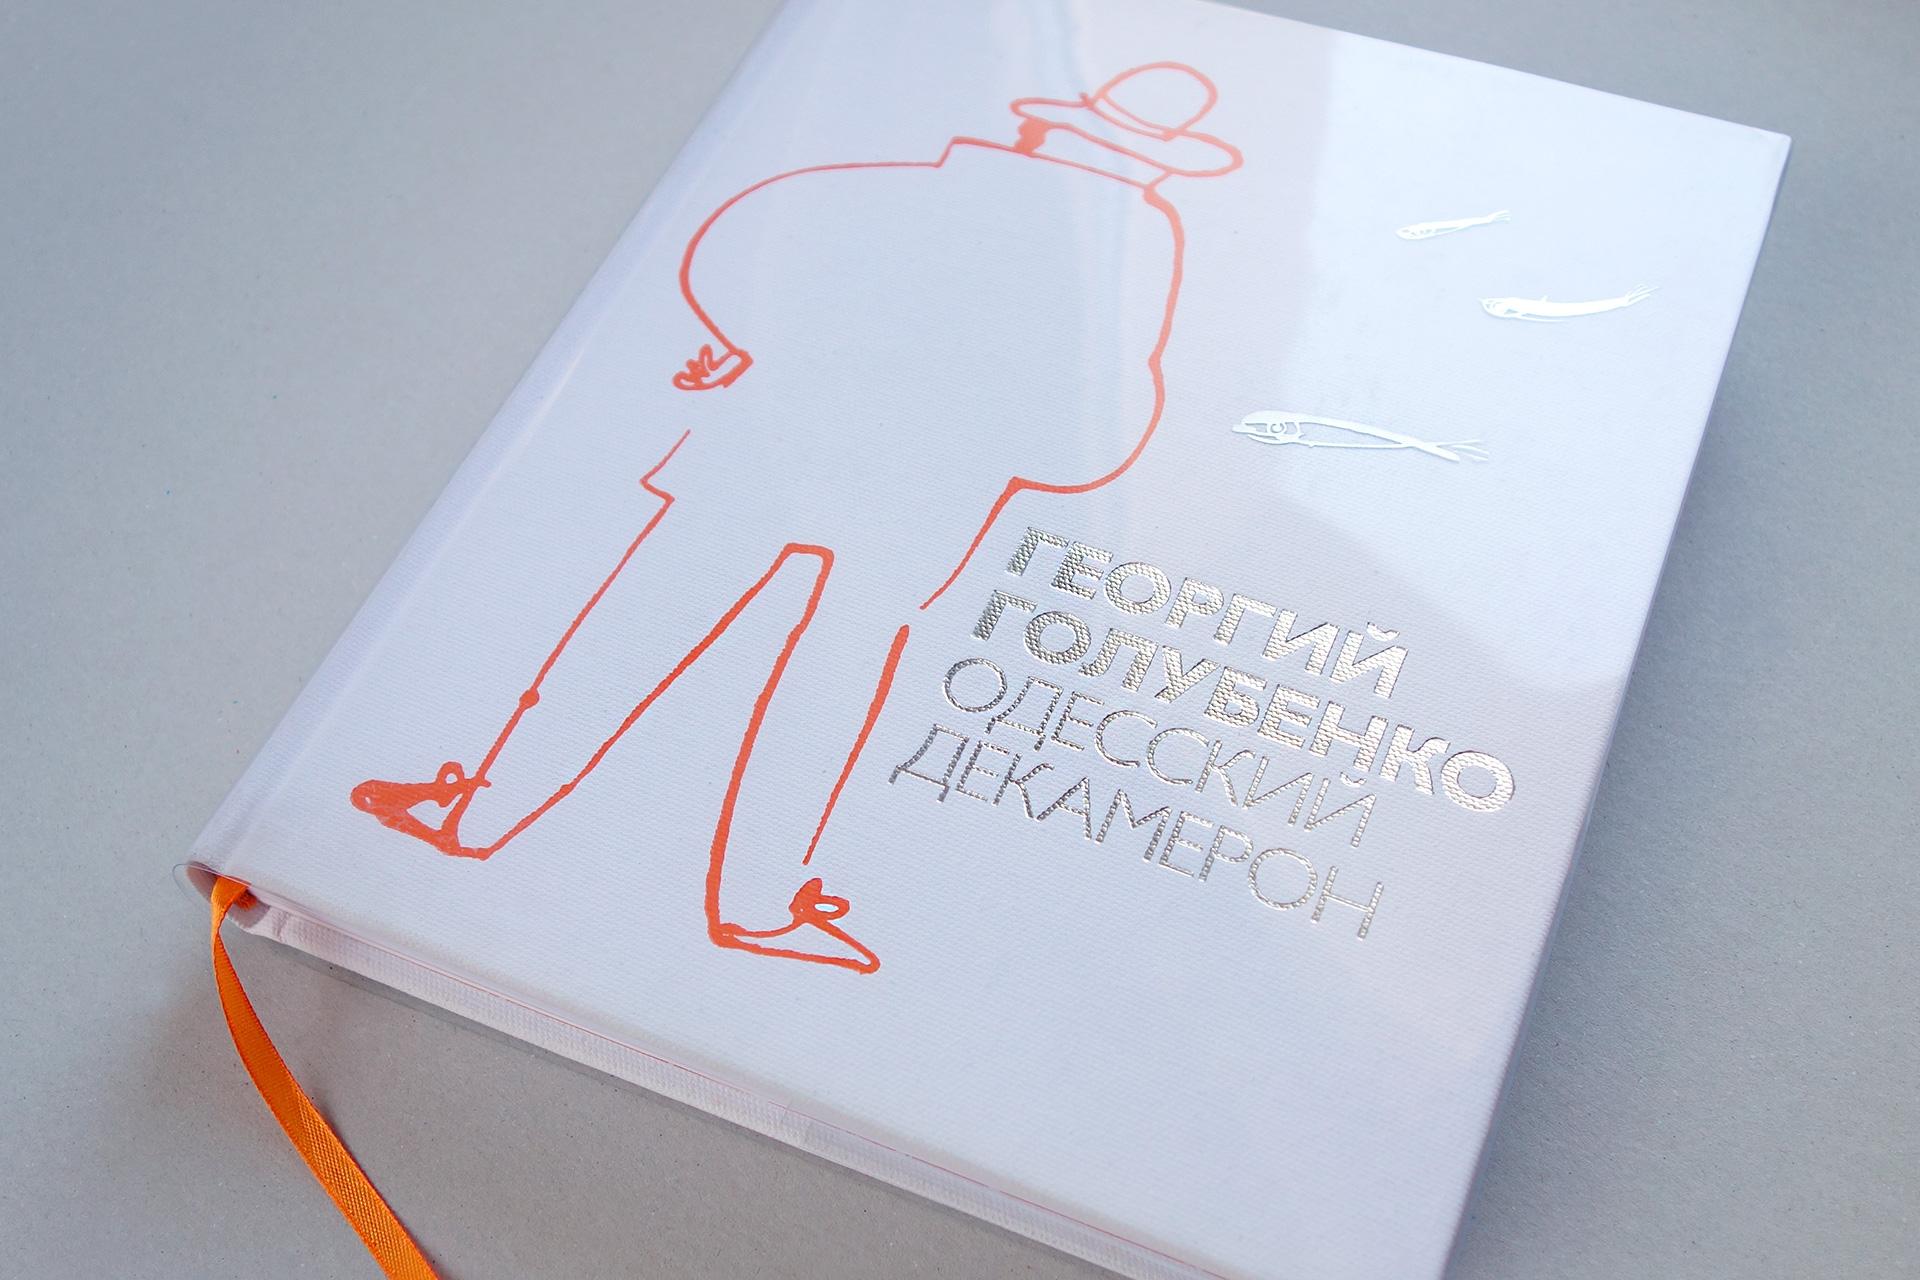 Asgard Branding, anniversary album, cover design, print, printed publications, book design, George Golubenko